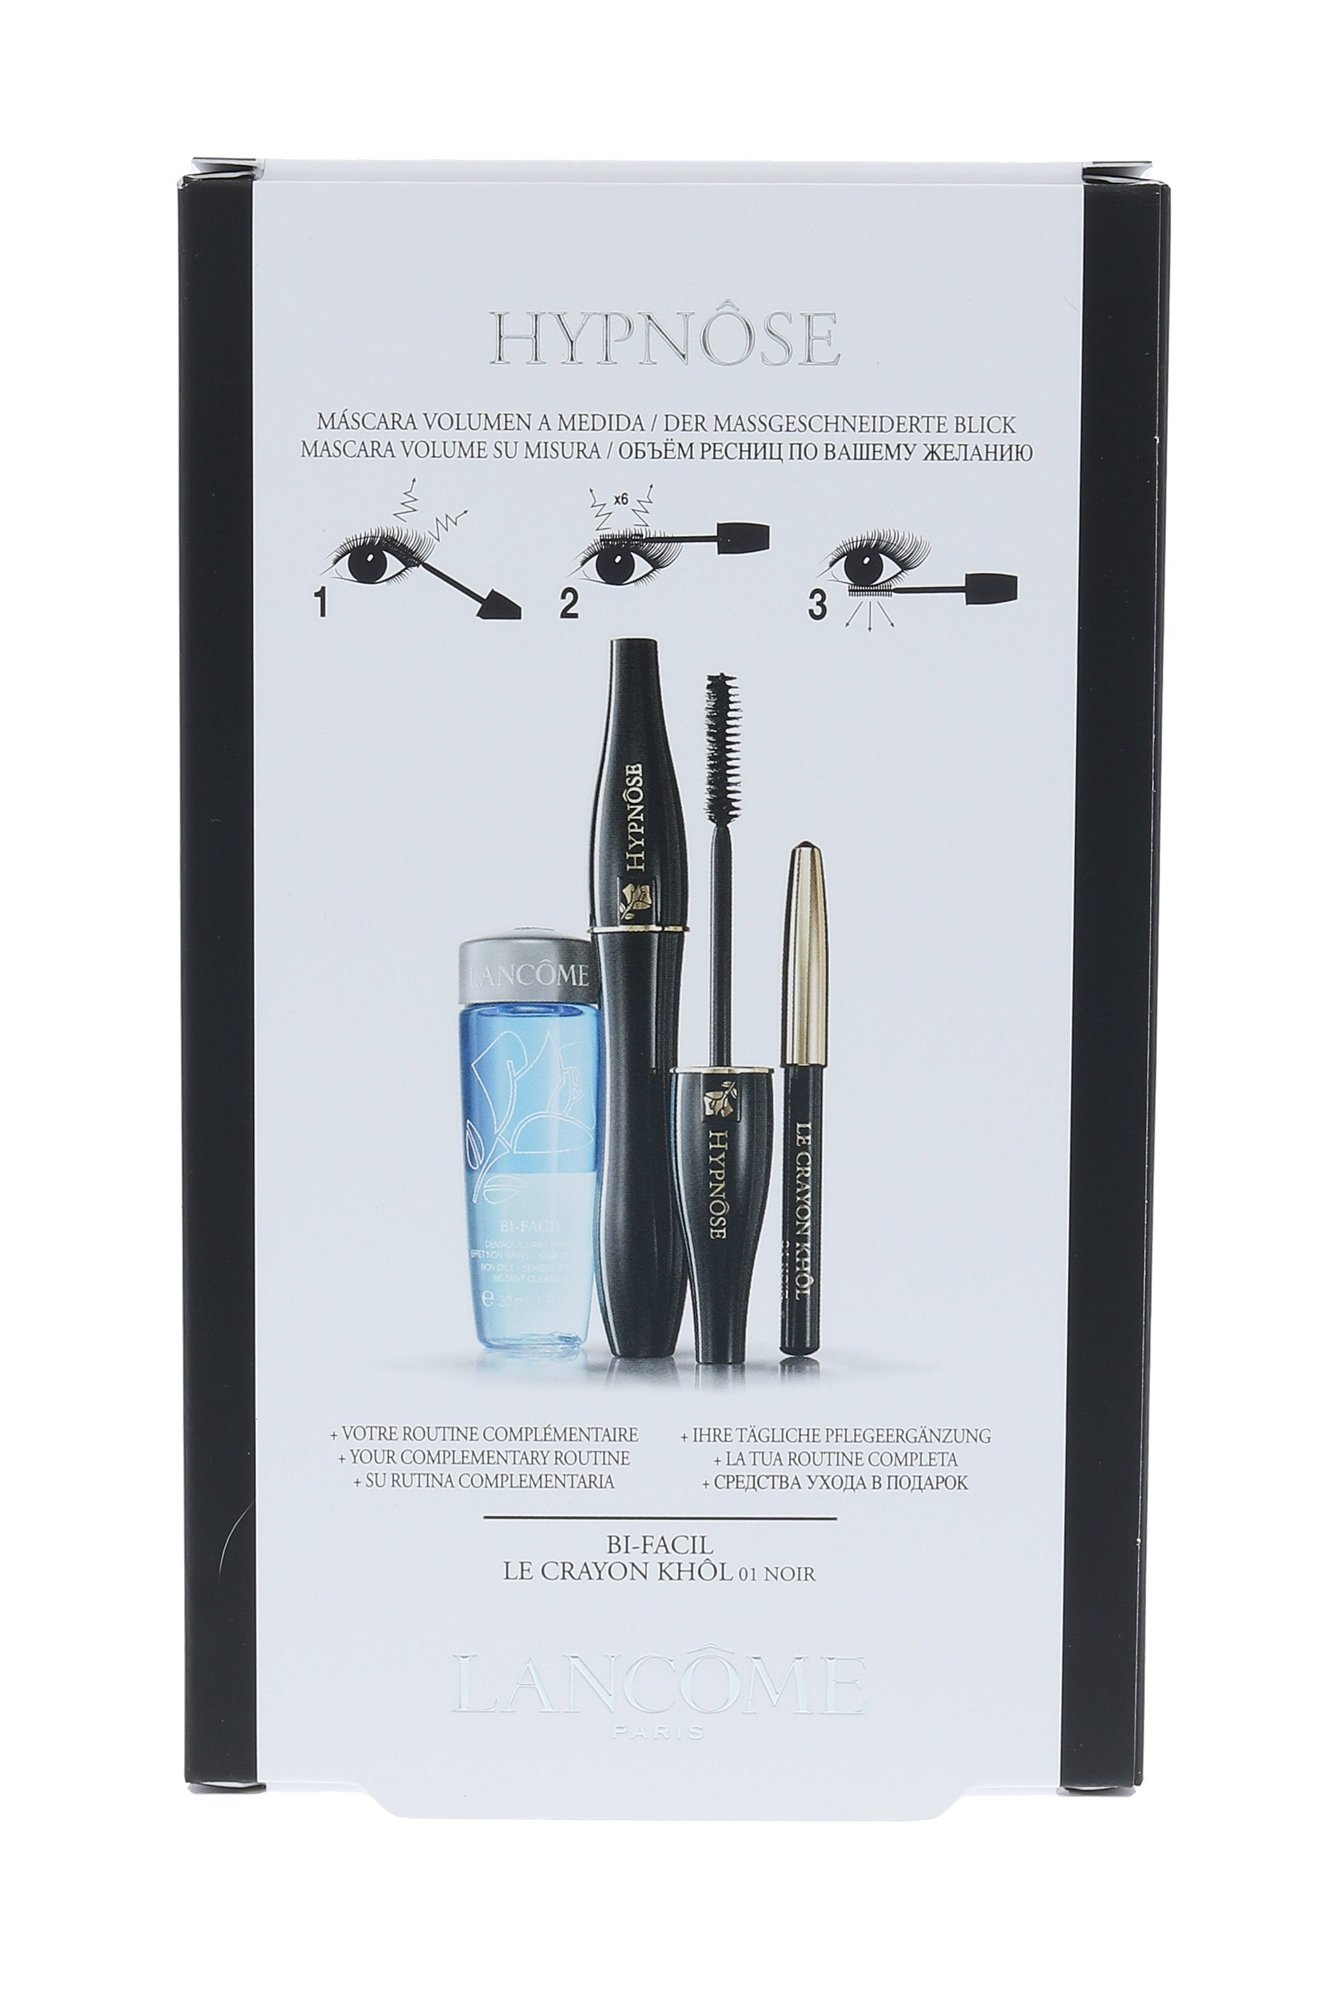 Lancôme Hypnose Cosmetic 6,2ml 01 Noir Hypnotic